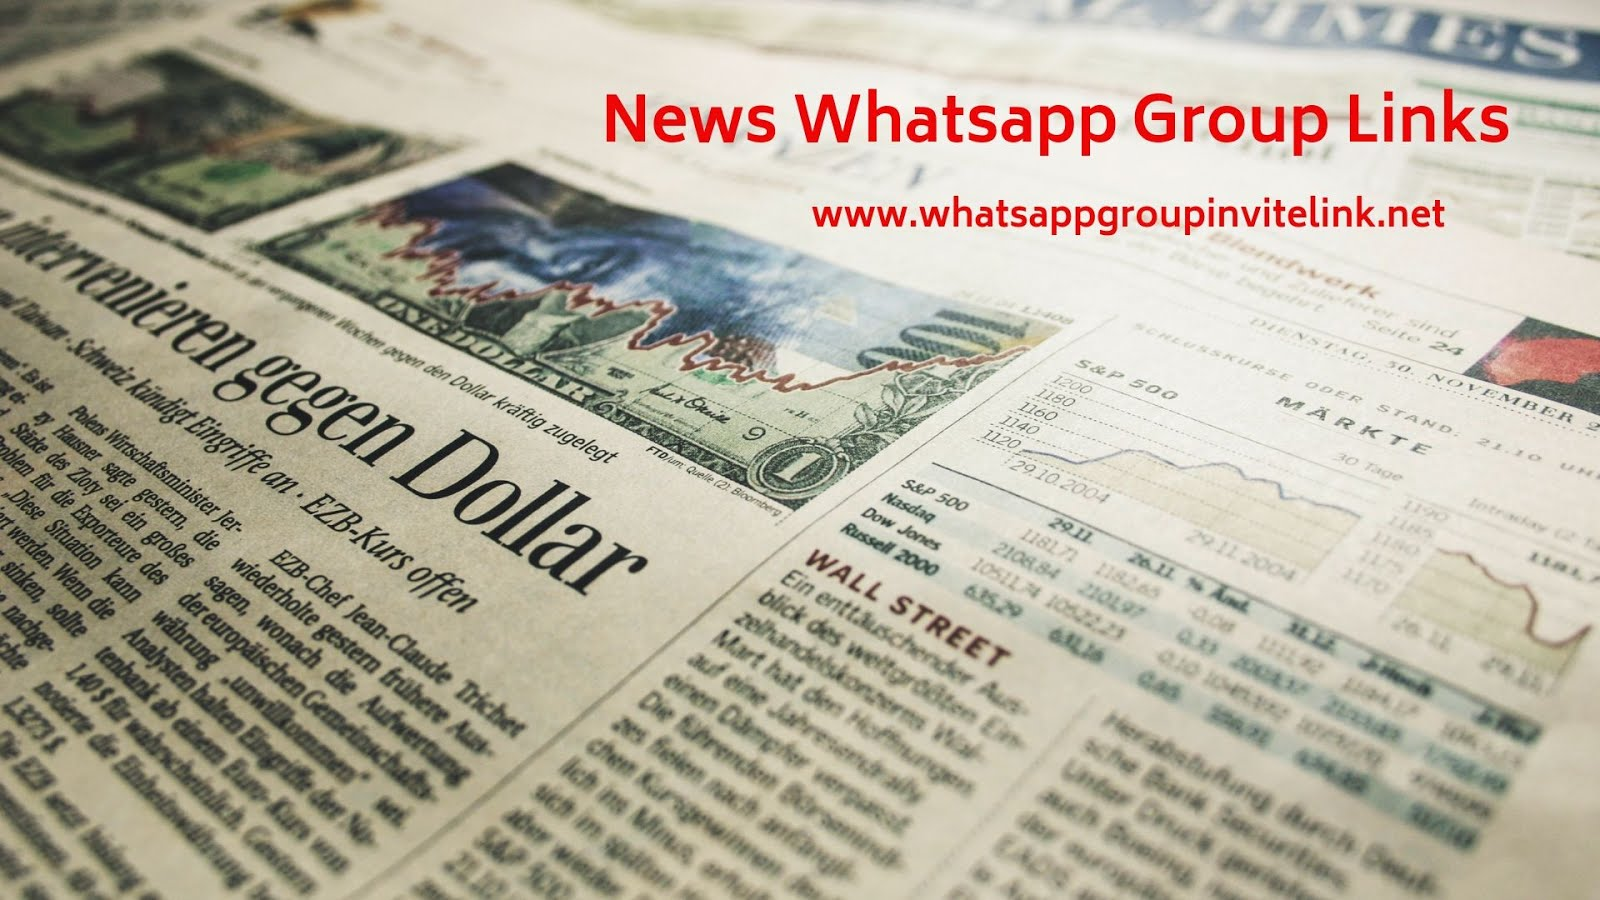 Whatsapp Group Invite Links: News Whatsapp Group Links